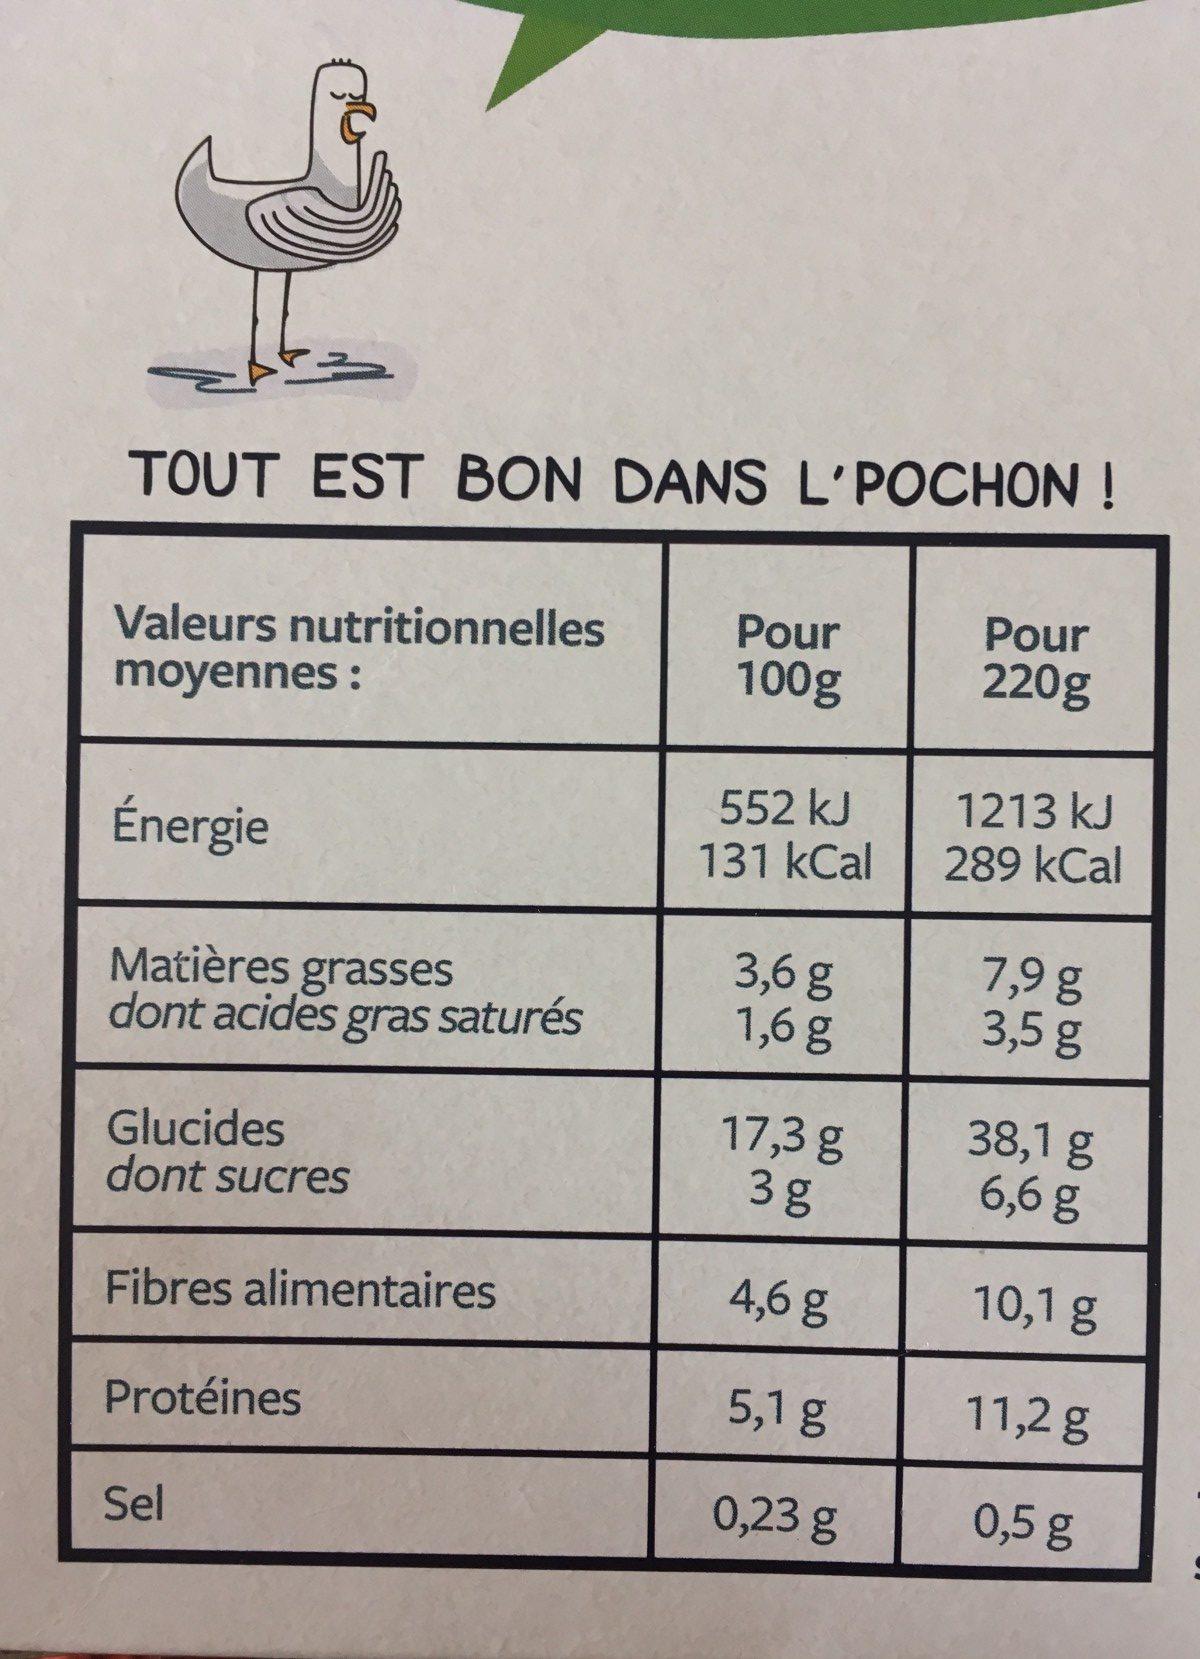 Poêlée Carotte, lentille et Haricot de mer - Voedingswaarden - fr